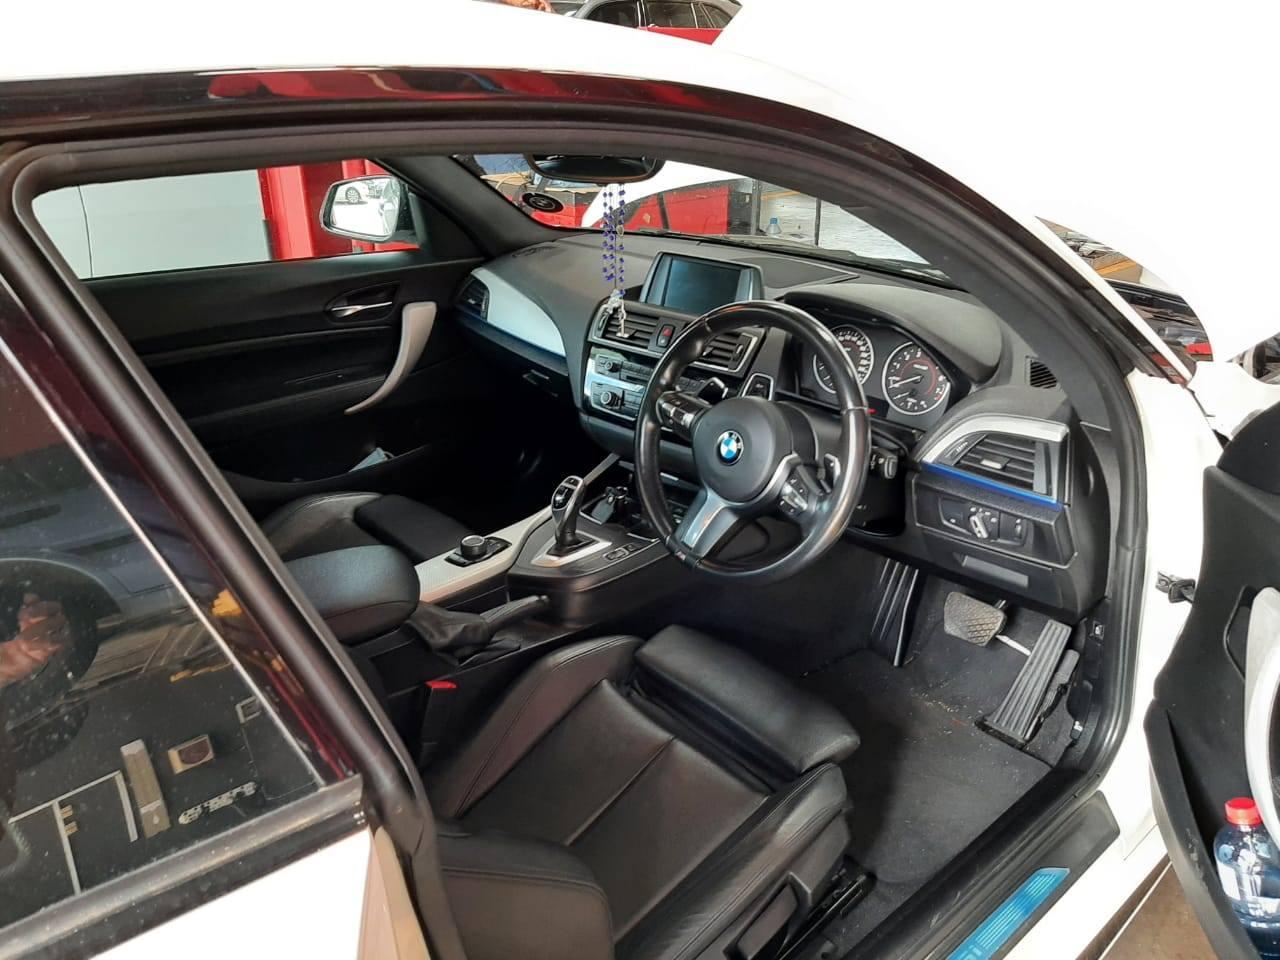 BMW 235i F22 - upholstery repairs at GP Motor Works